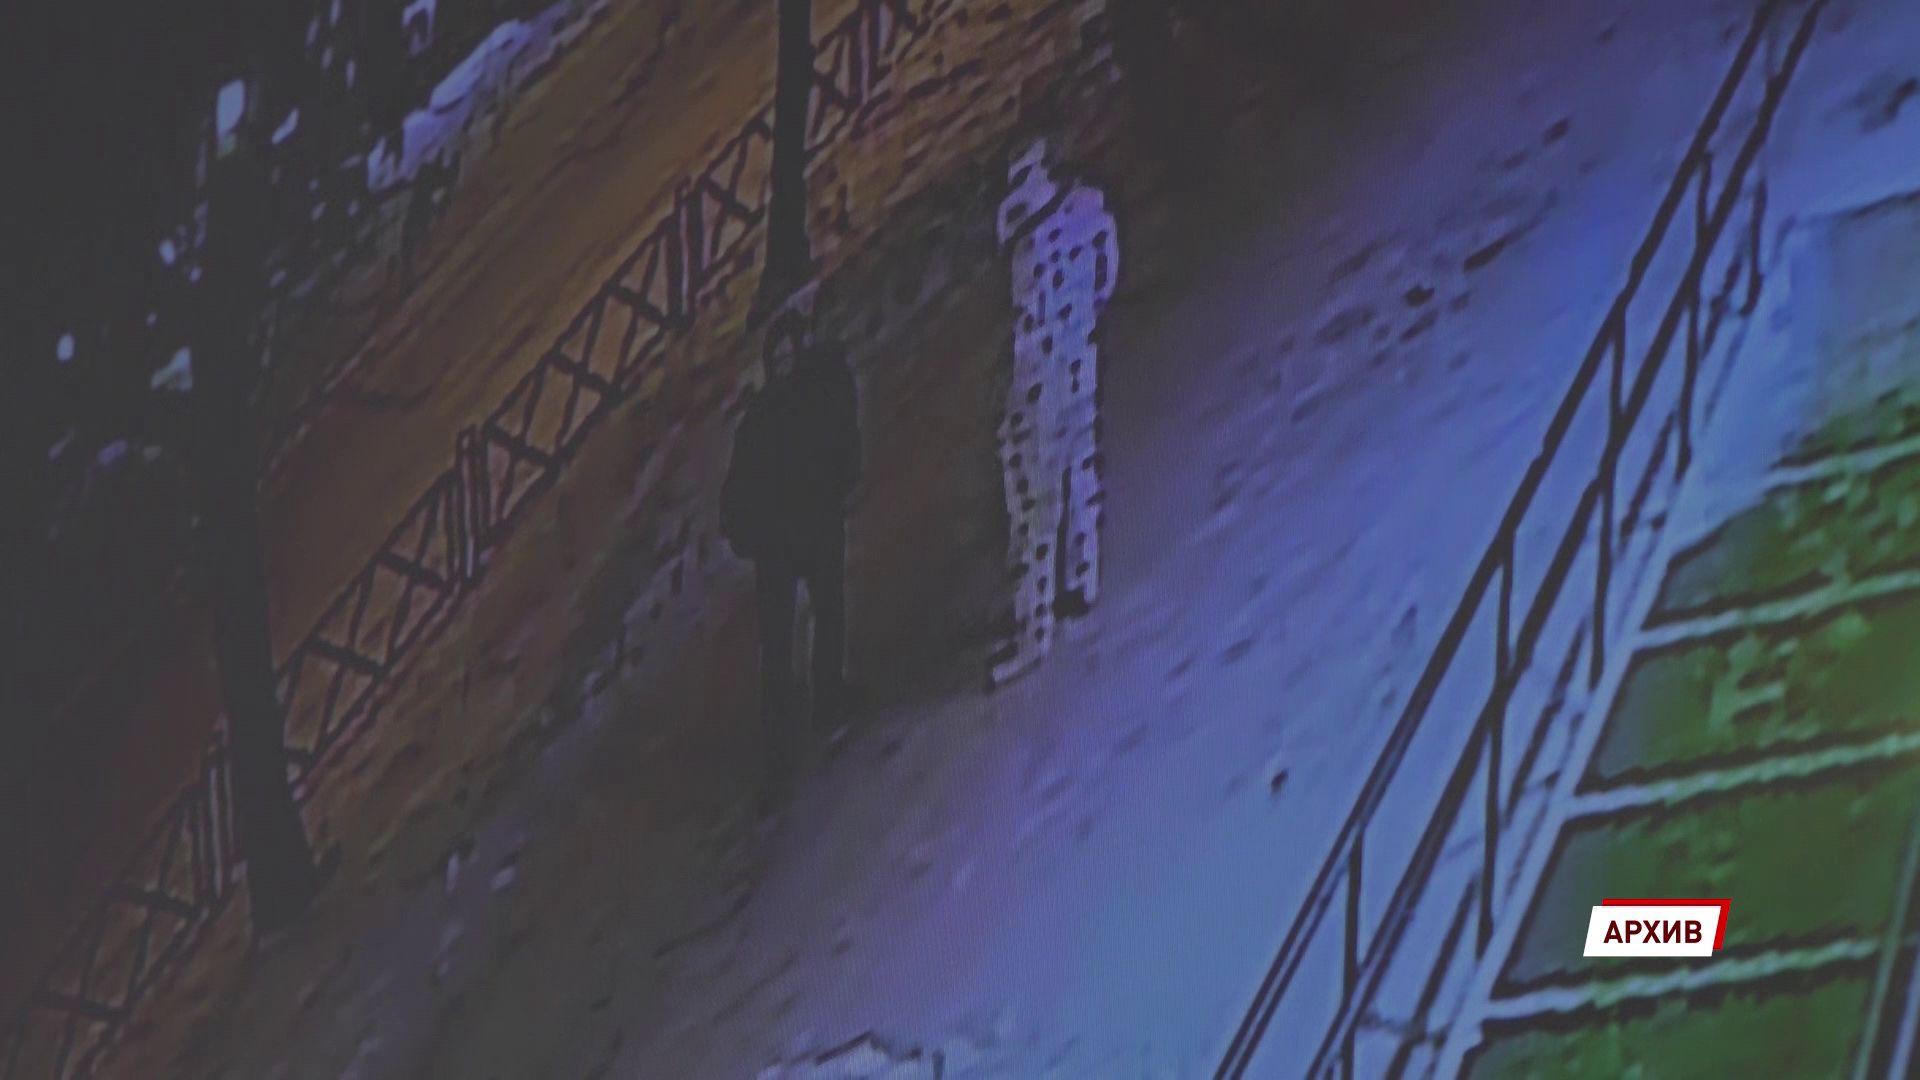 Суд вынес приговор ярославцу, напавшему с ножом на друга в костюме далматинца